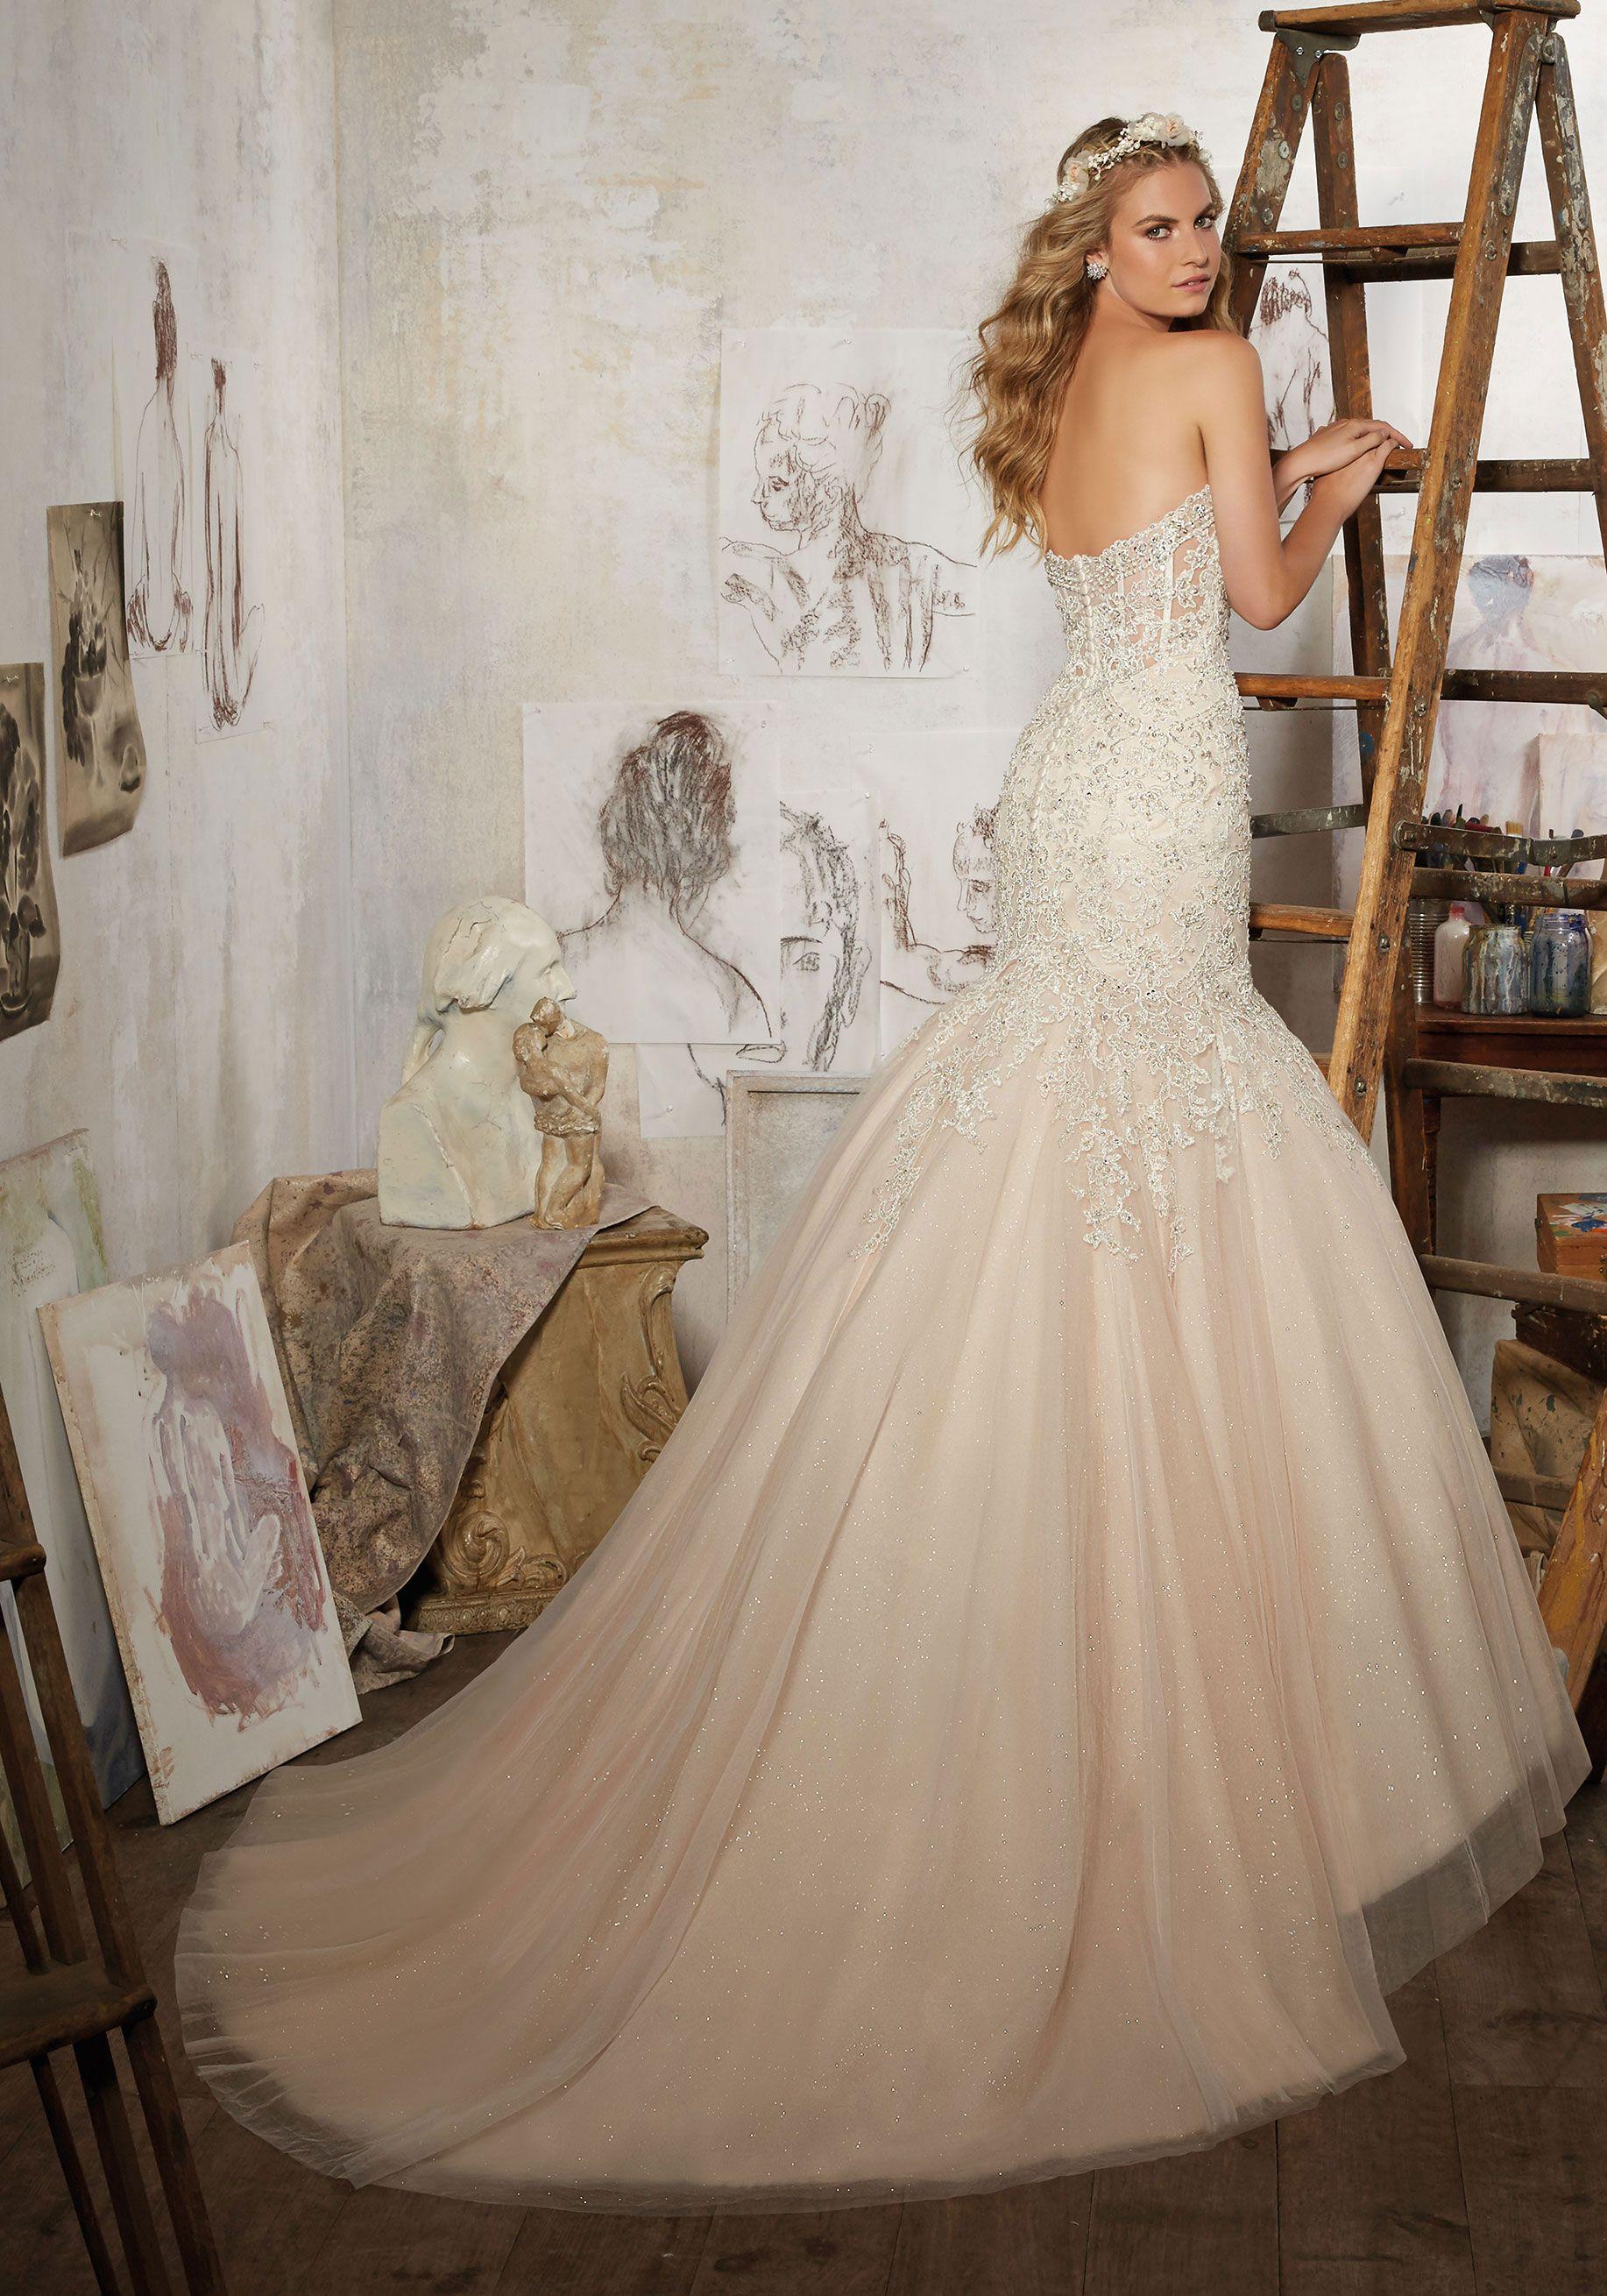 Mariela Wedding Dress Morilee Mori Lee Wedding Dress Bridal Wedding Dresses Wedding Dress Styles [ 2620 x 1834 Pixel ]